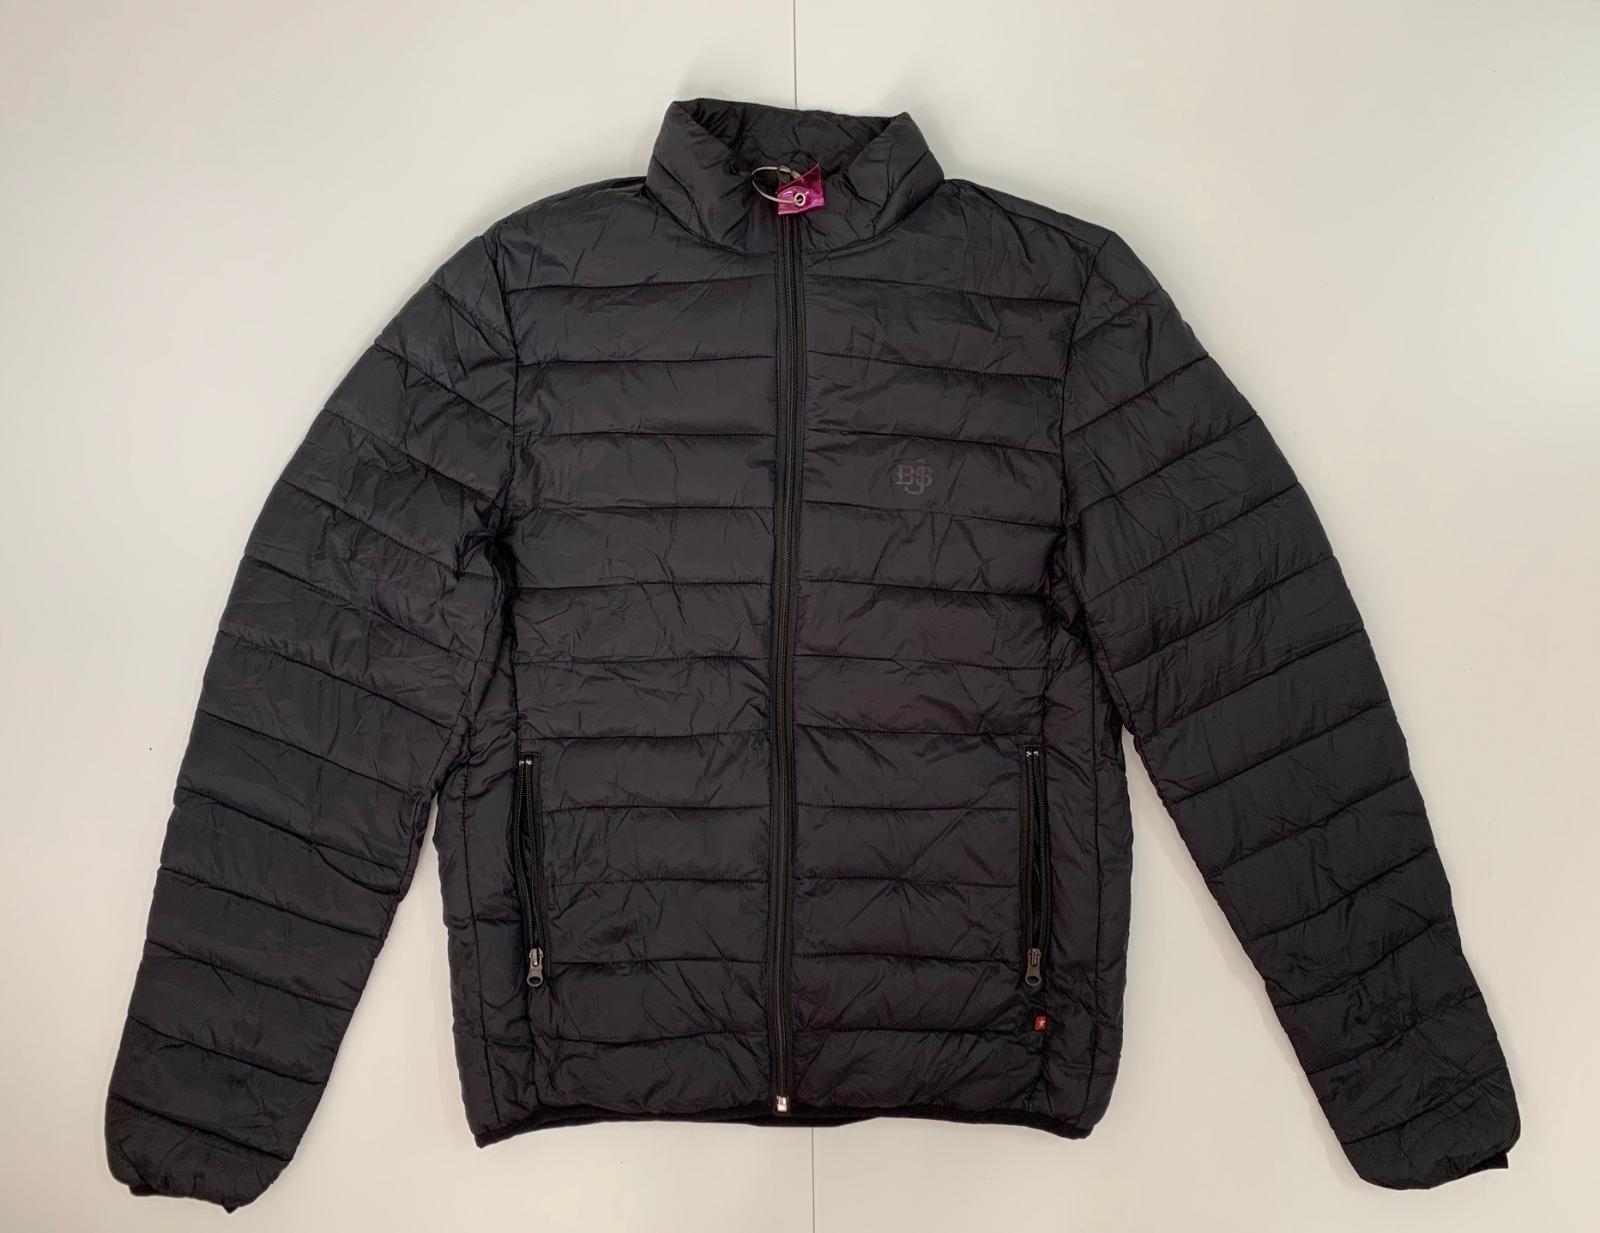 Темная мужская куртка от бренда BIG STAR